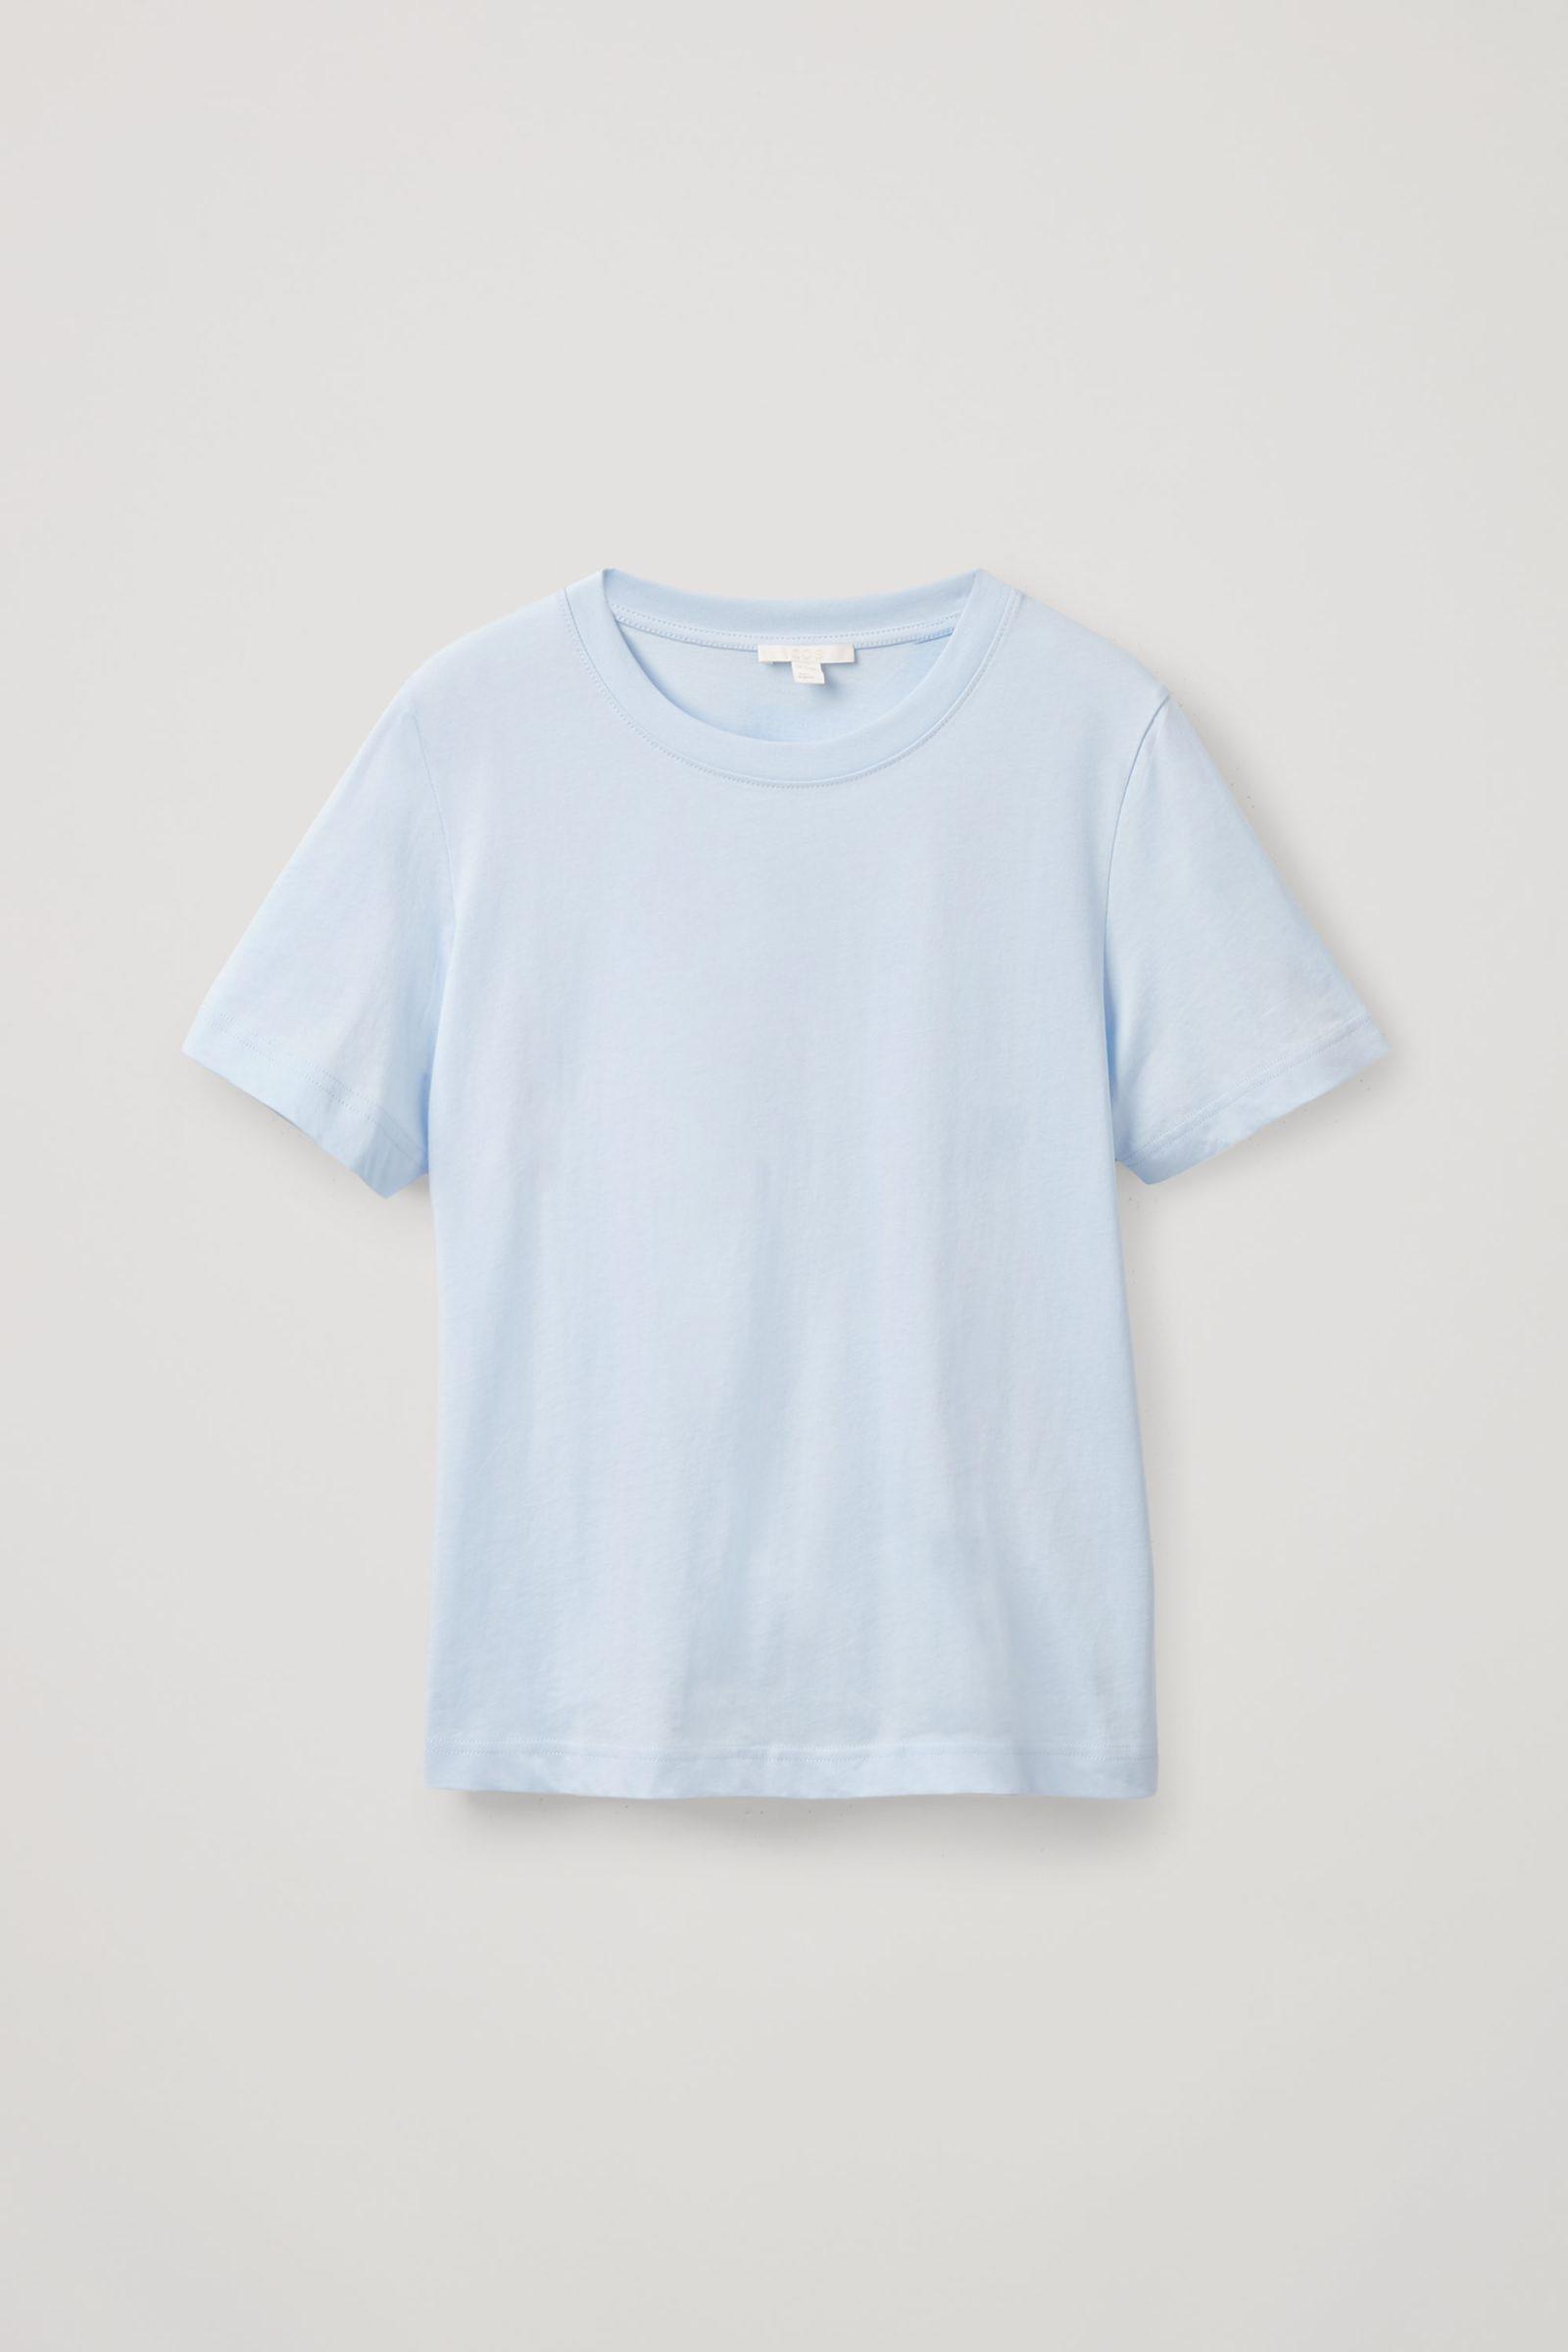 COS 코튼 저지 티셔츠의 블루컬러 Product입니다.